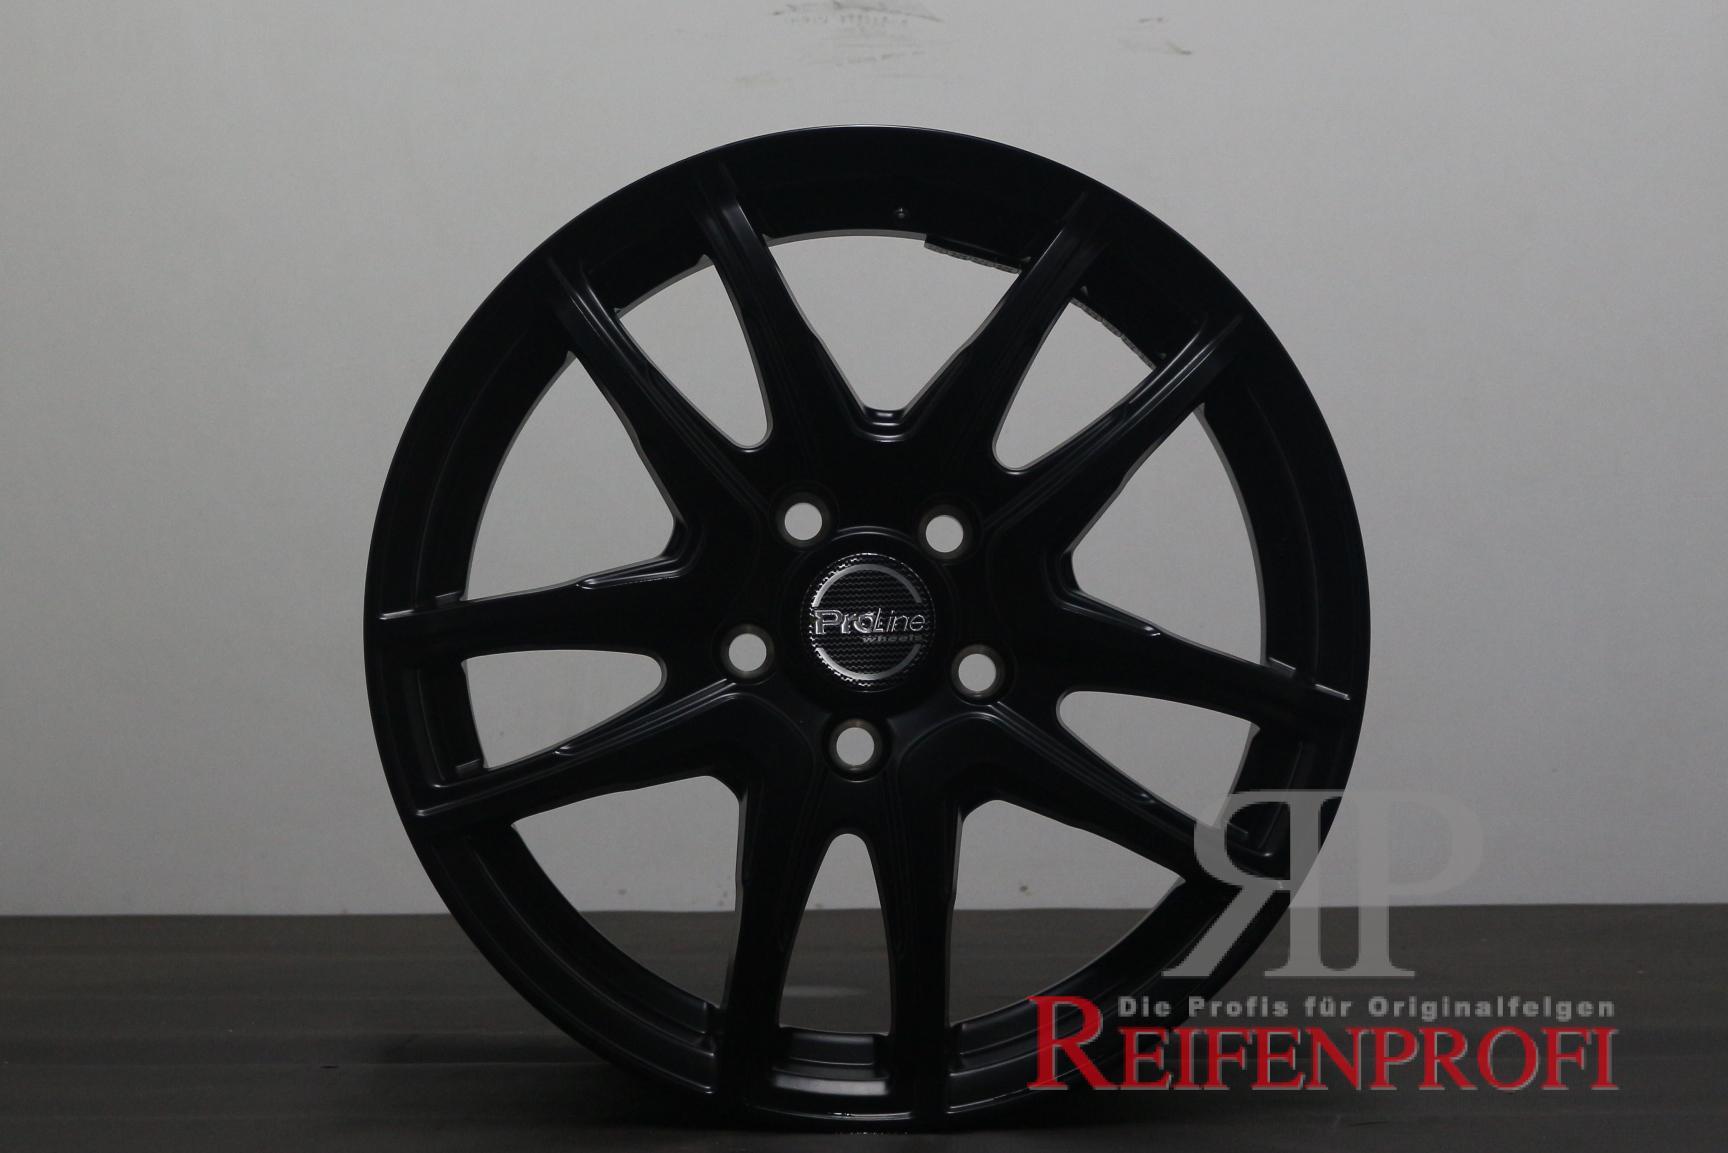 proline wheels vx100 mercedes citan renault 16 zoll felgen. Black Bedroom Furniture Sets. Home Design Ideas